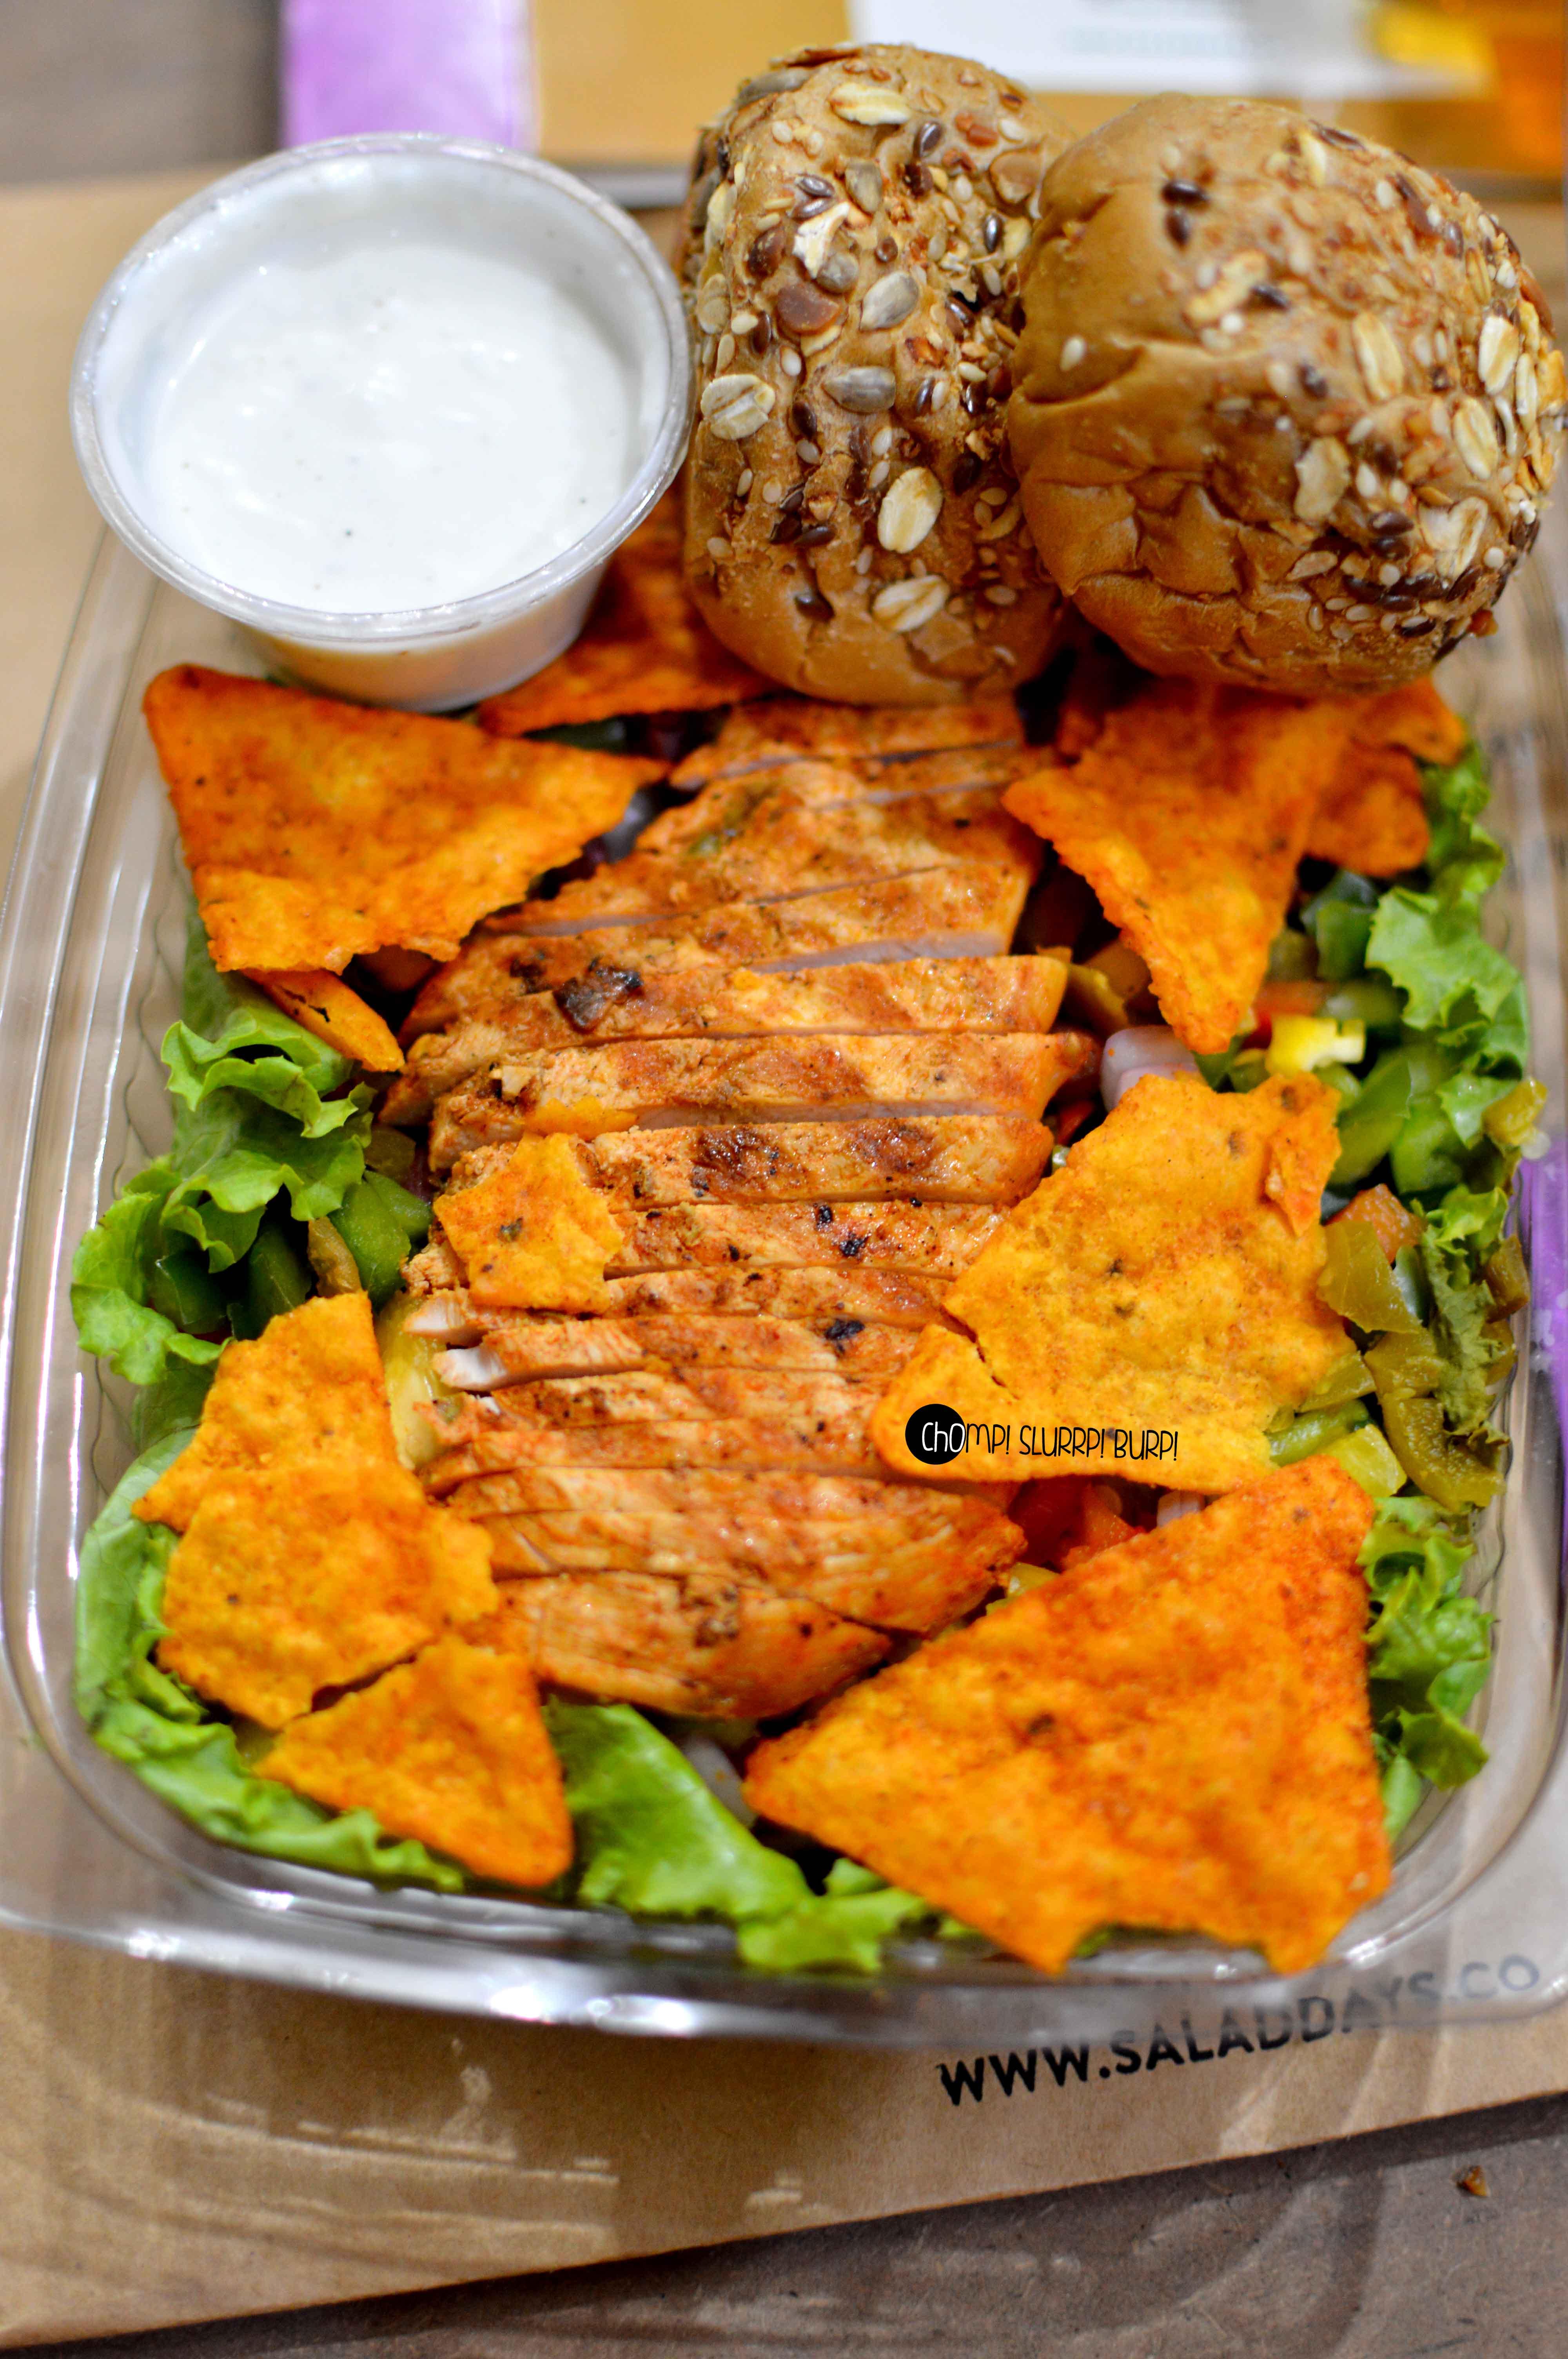 Salad days (7)